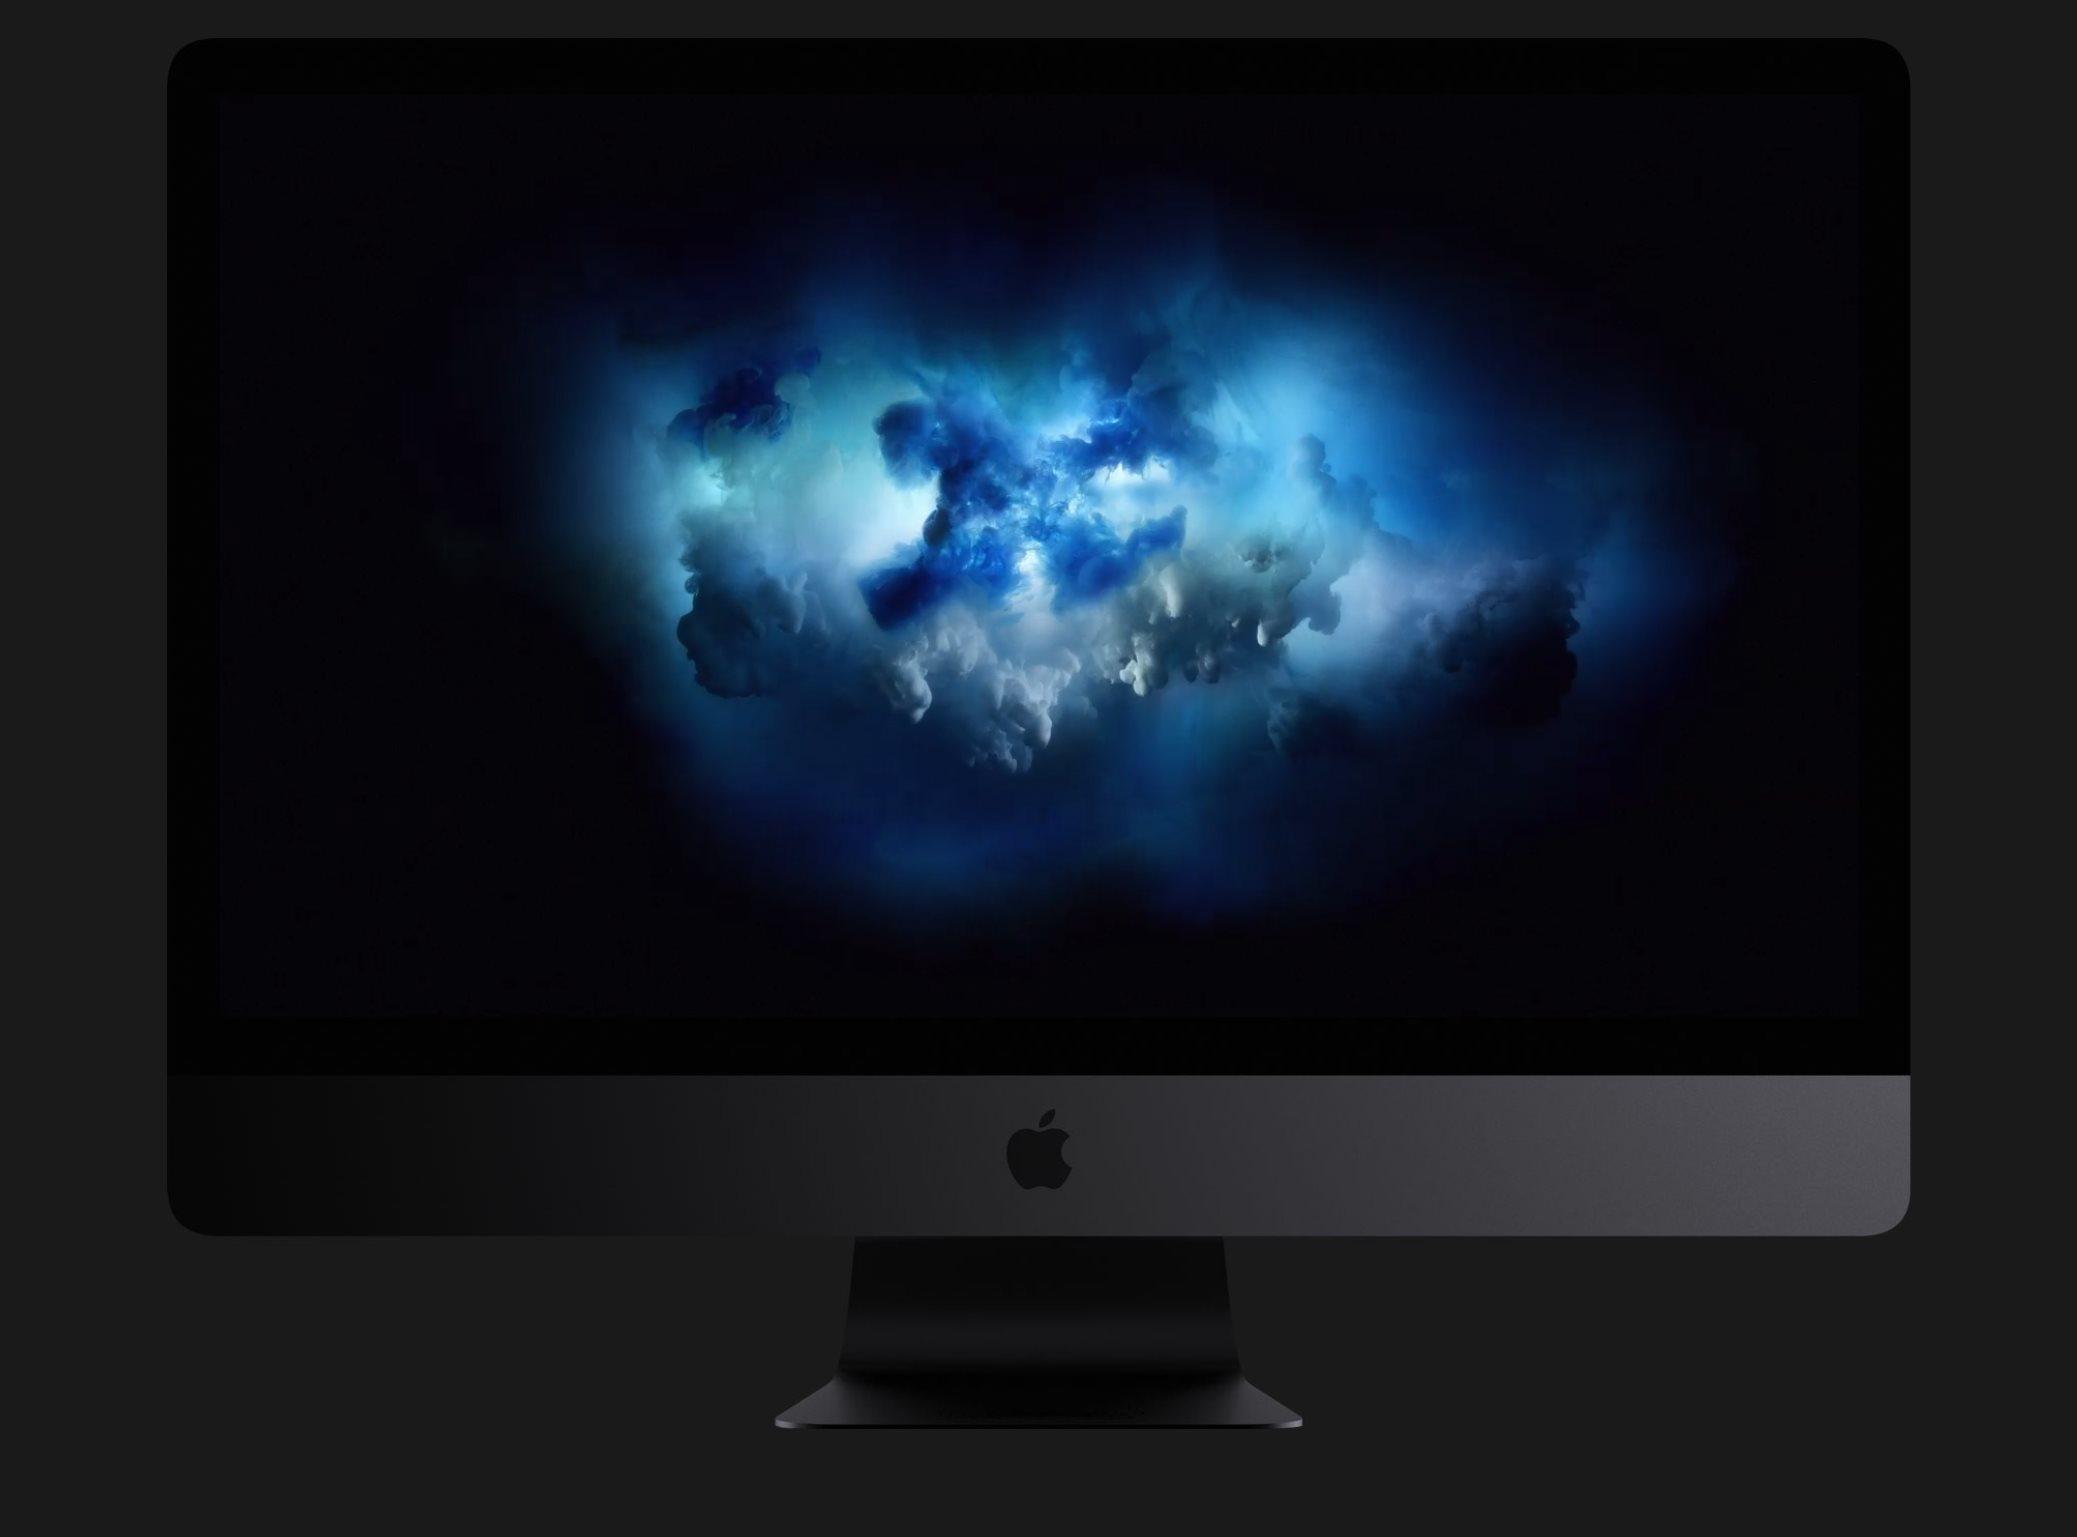 laugh-microsoft-laugh-top-apple-imac-pro-to-cost-17-000-516449-3.jpg